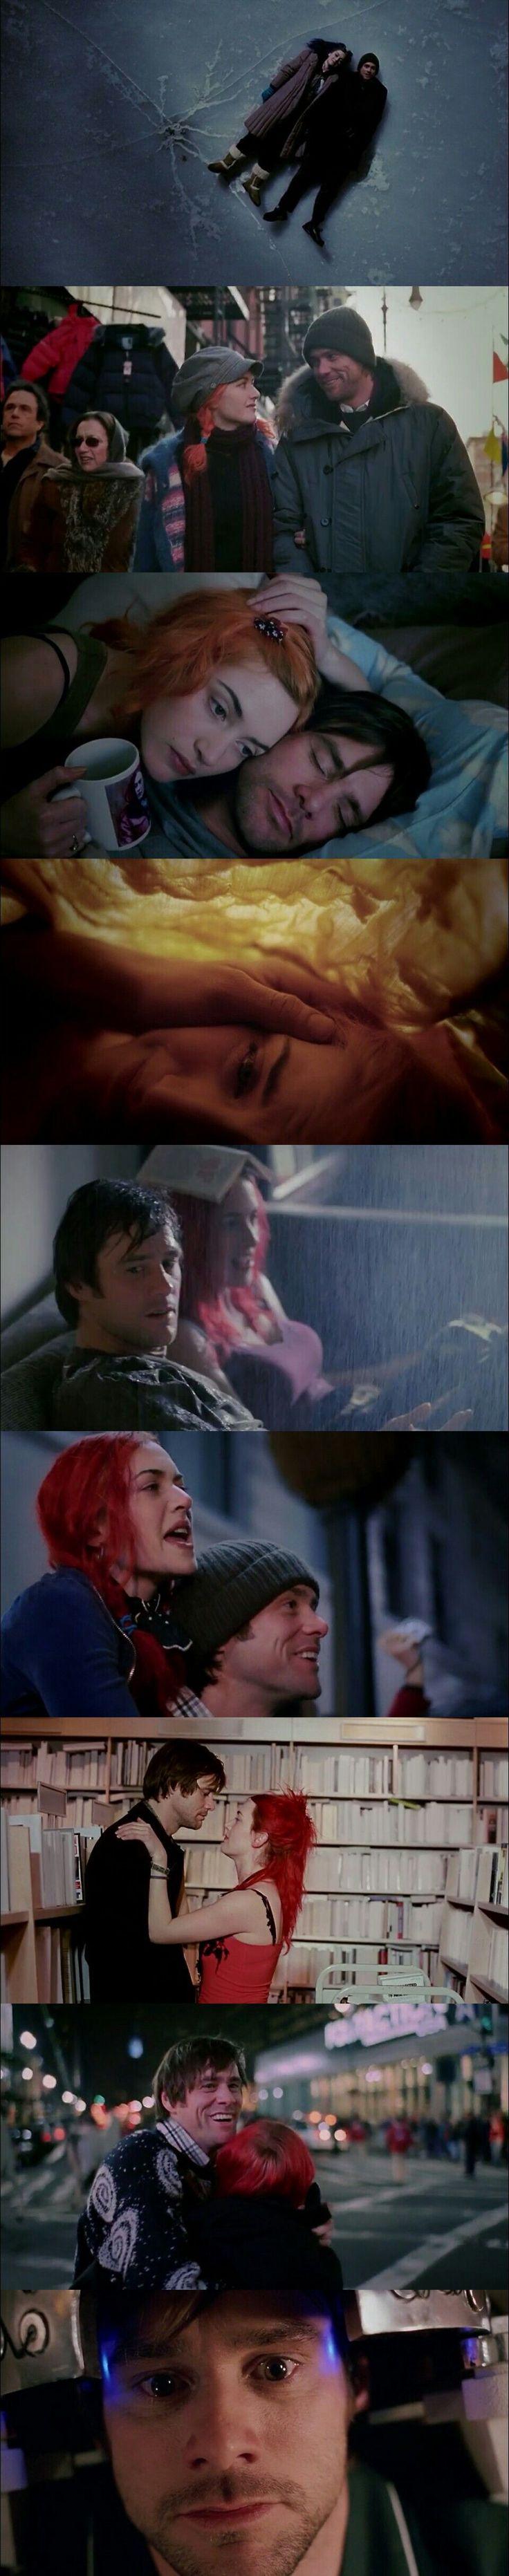 Eternal Sunshine Of The Spotless Mind(2004) Cinematography by Ellen Kuras. #DigitalFilmSchool